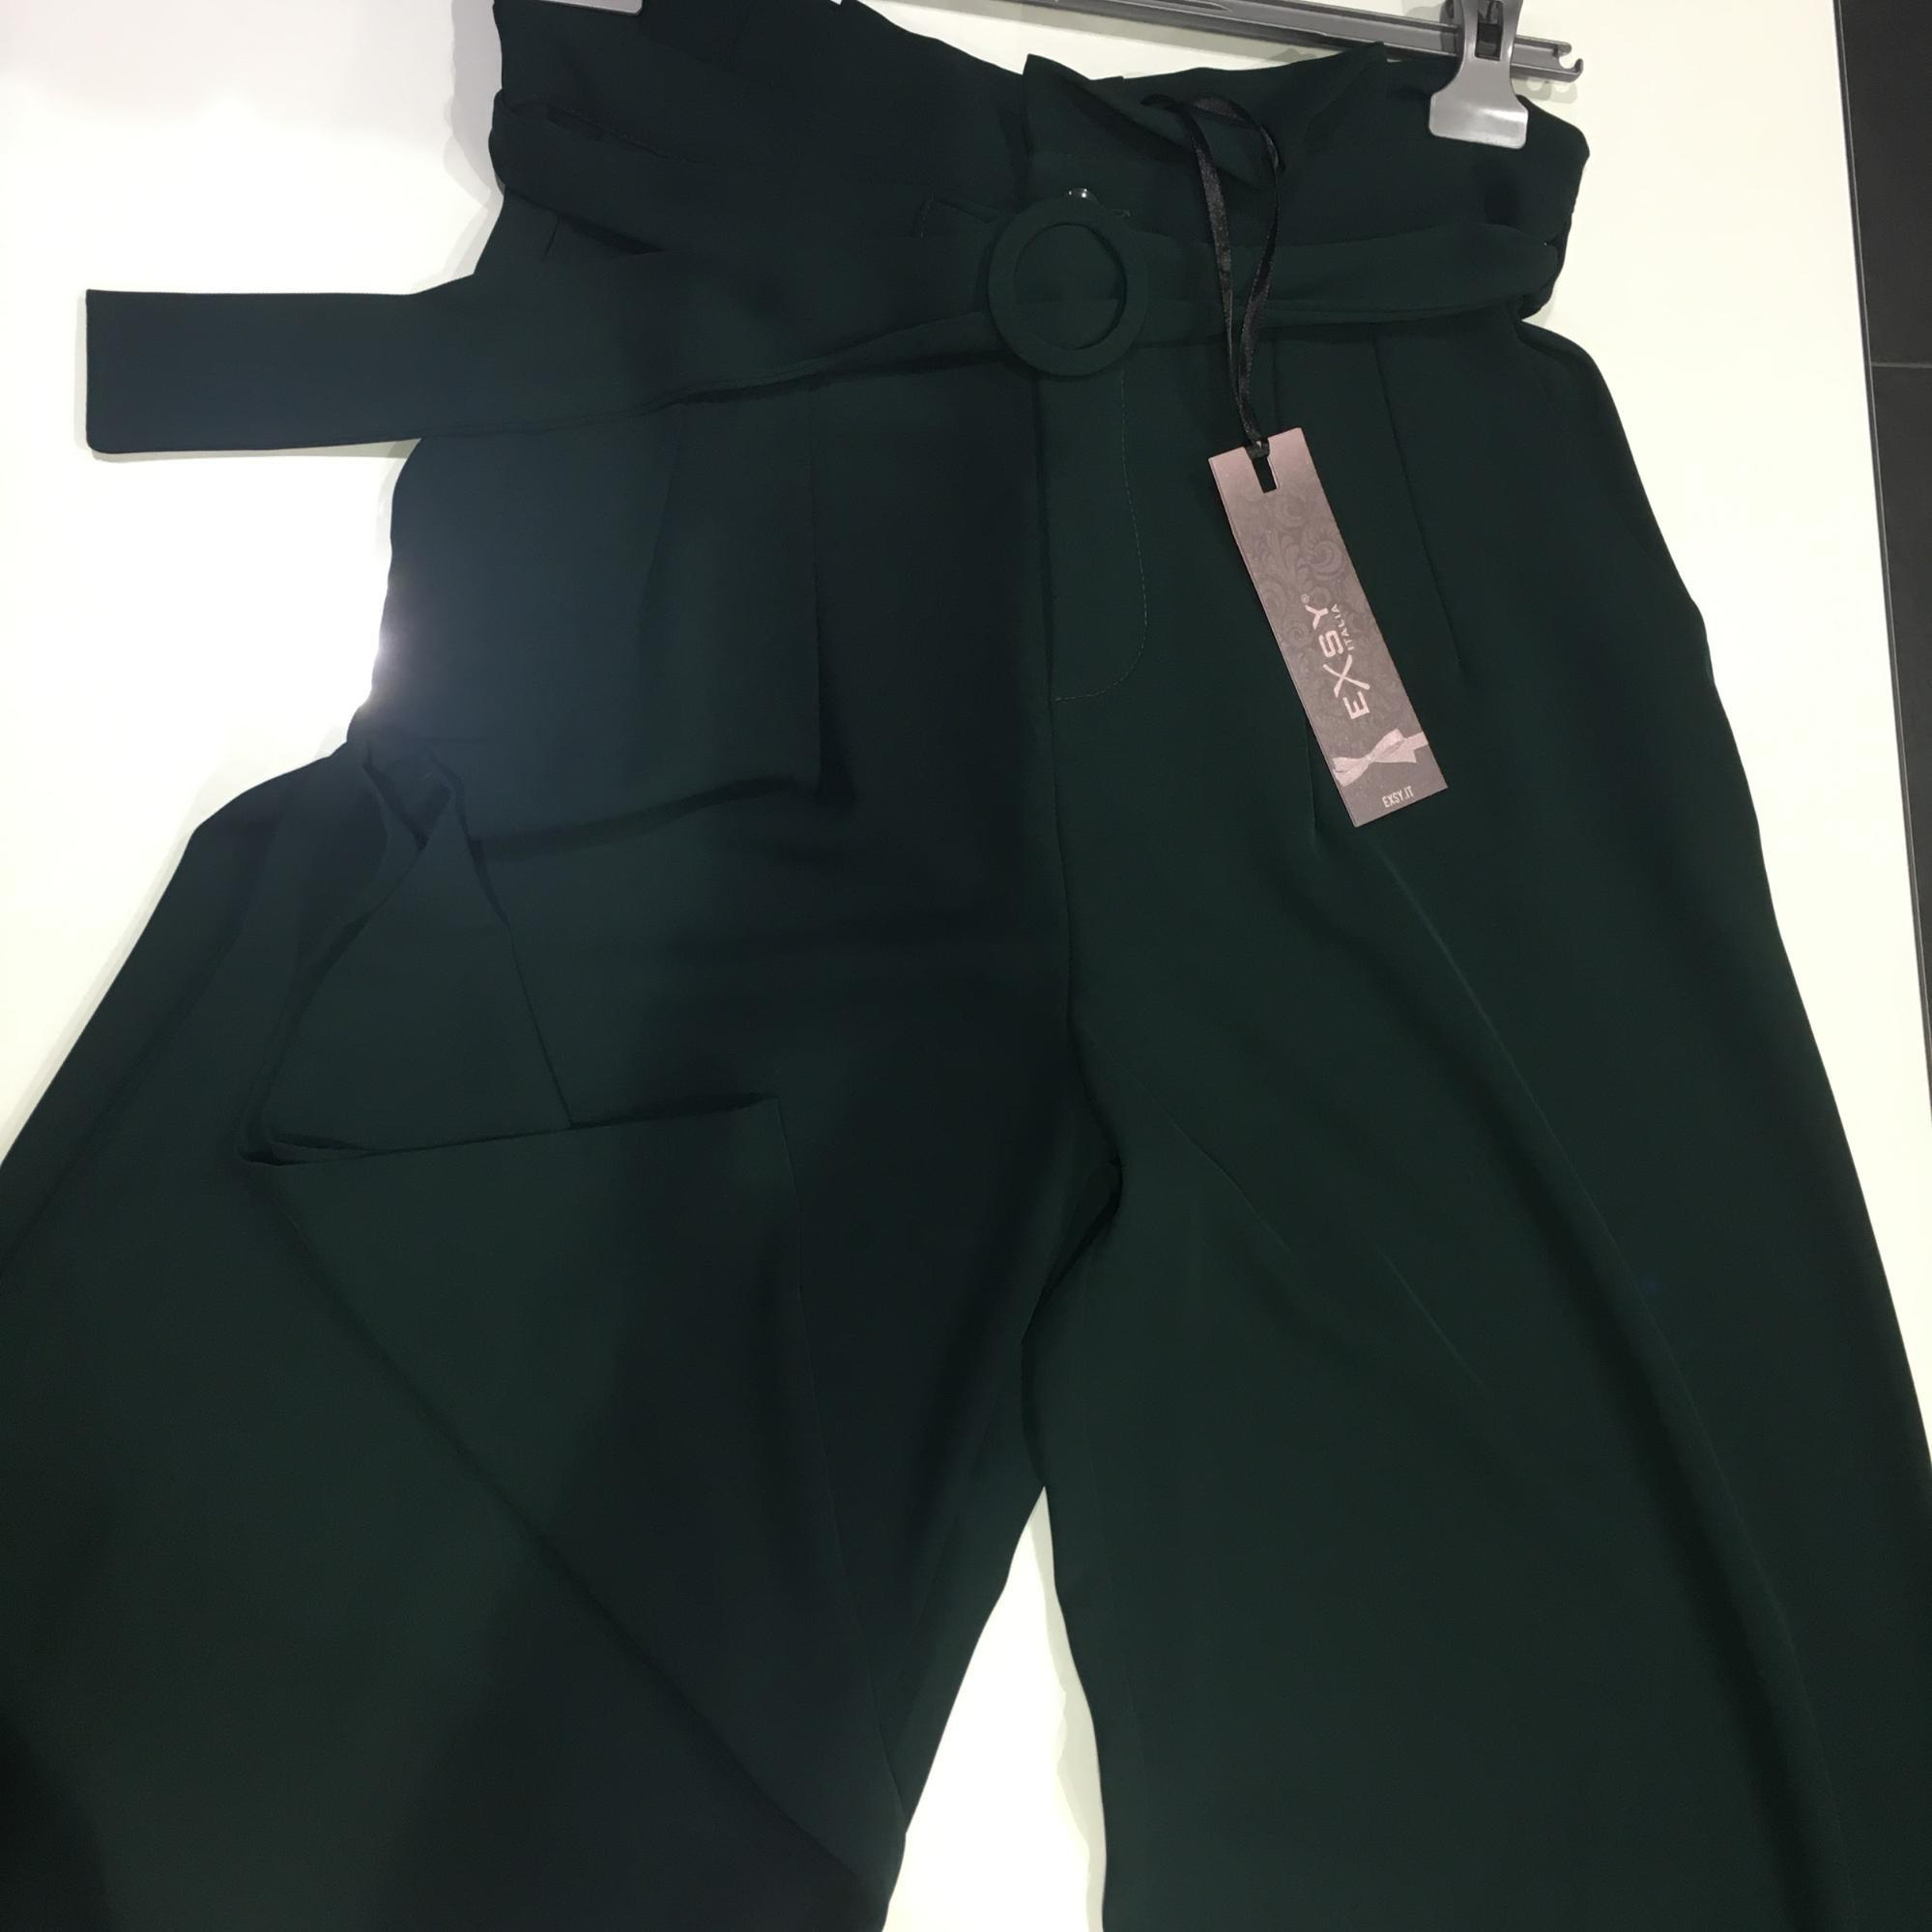 Pantalone Cady palazzo donna color verde